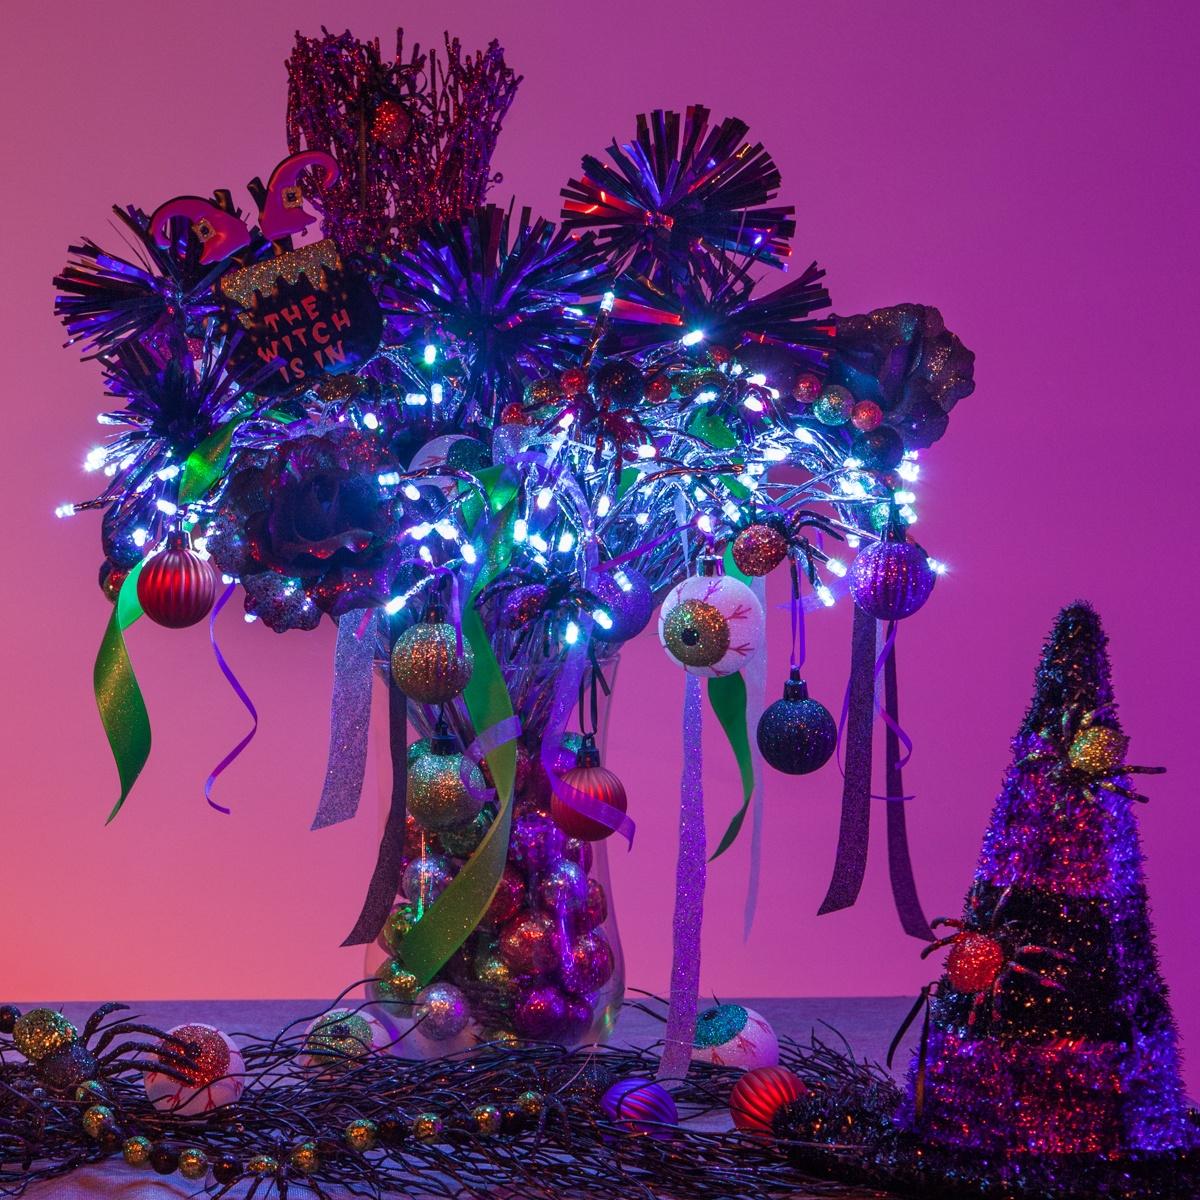 https://cdn.christmaslightsetc.com/images/CategoryDetail/56179/starburst-lighted-branches-halloween-decoration-0889.jpg